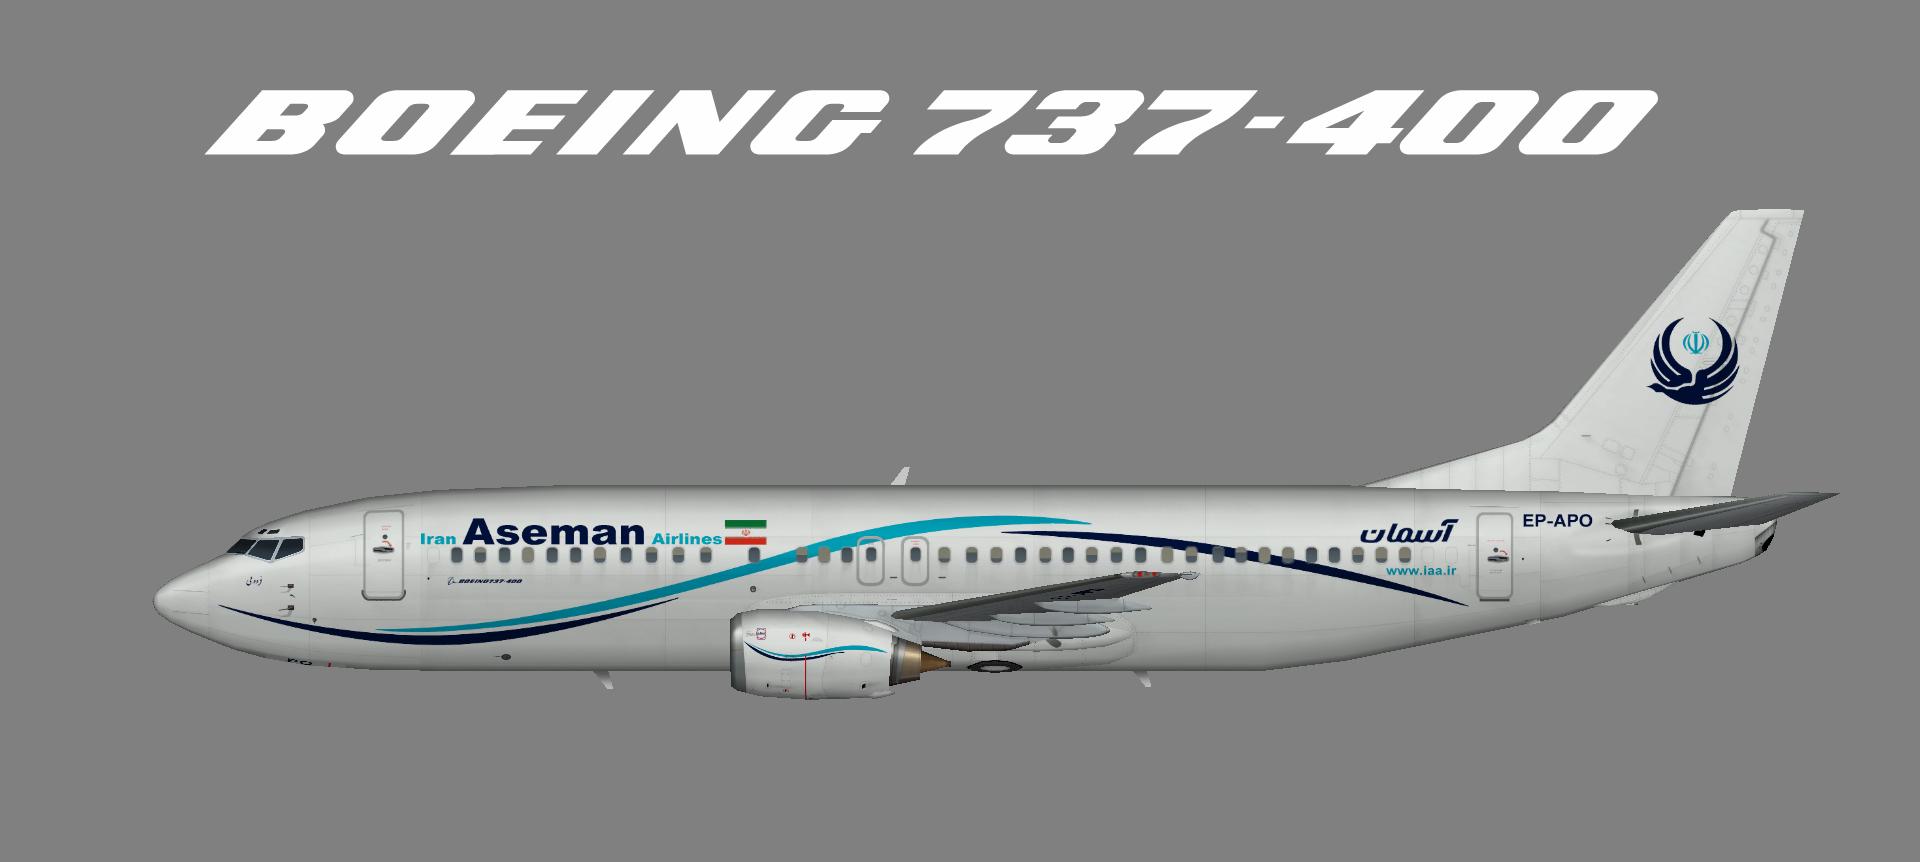 Iran Aseman 737-400